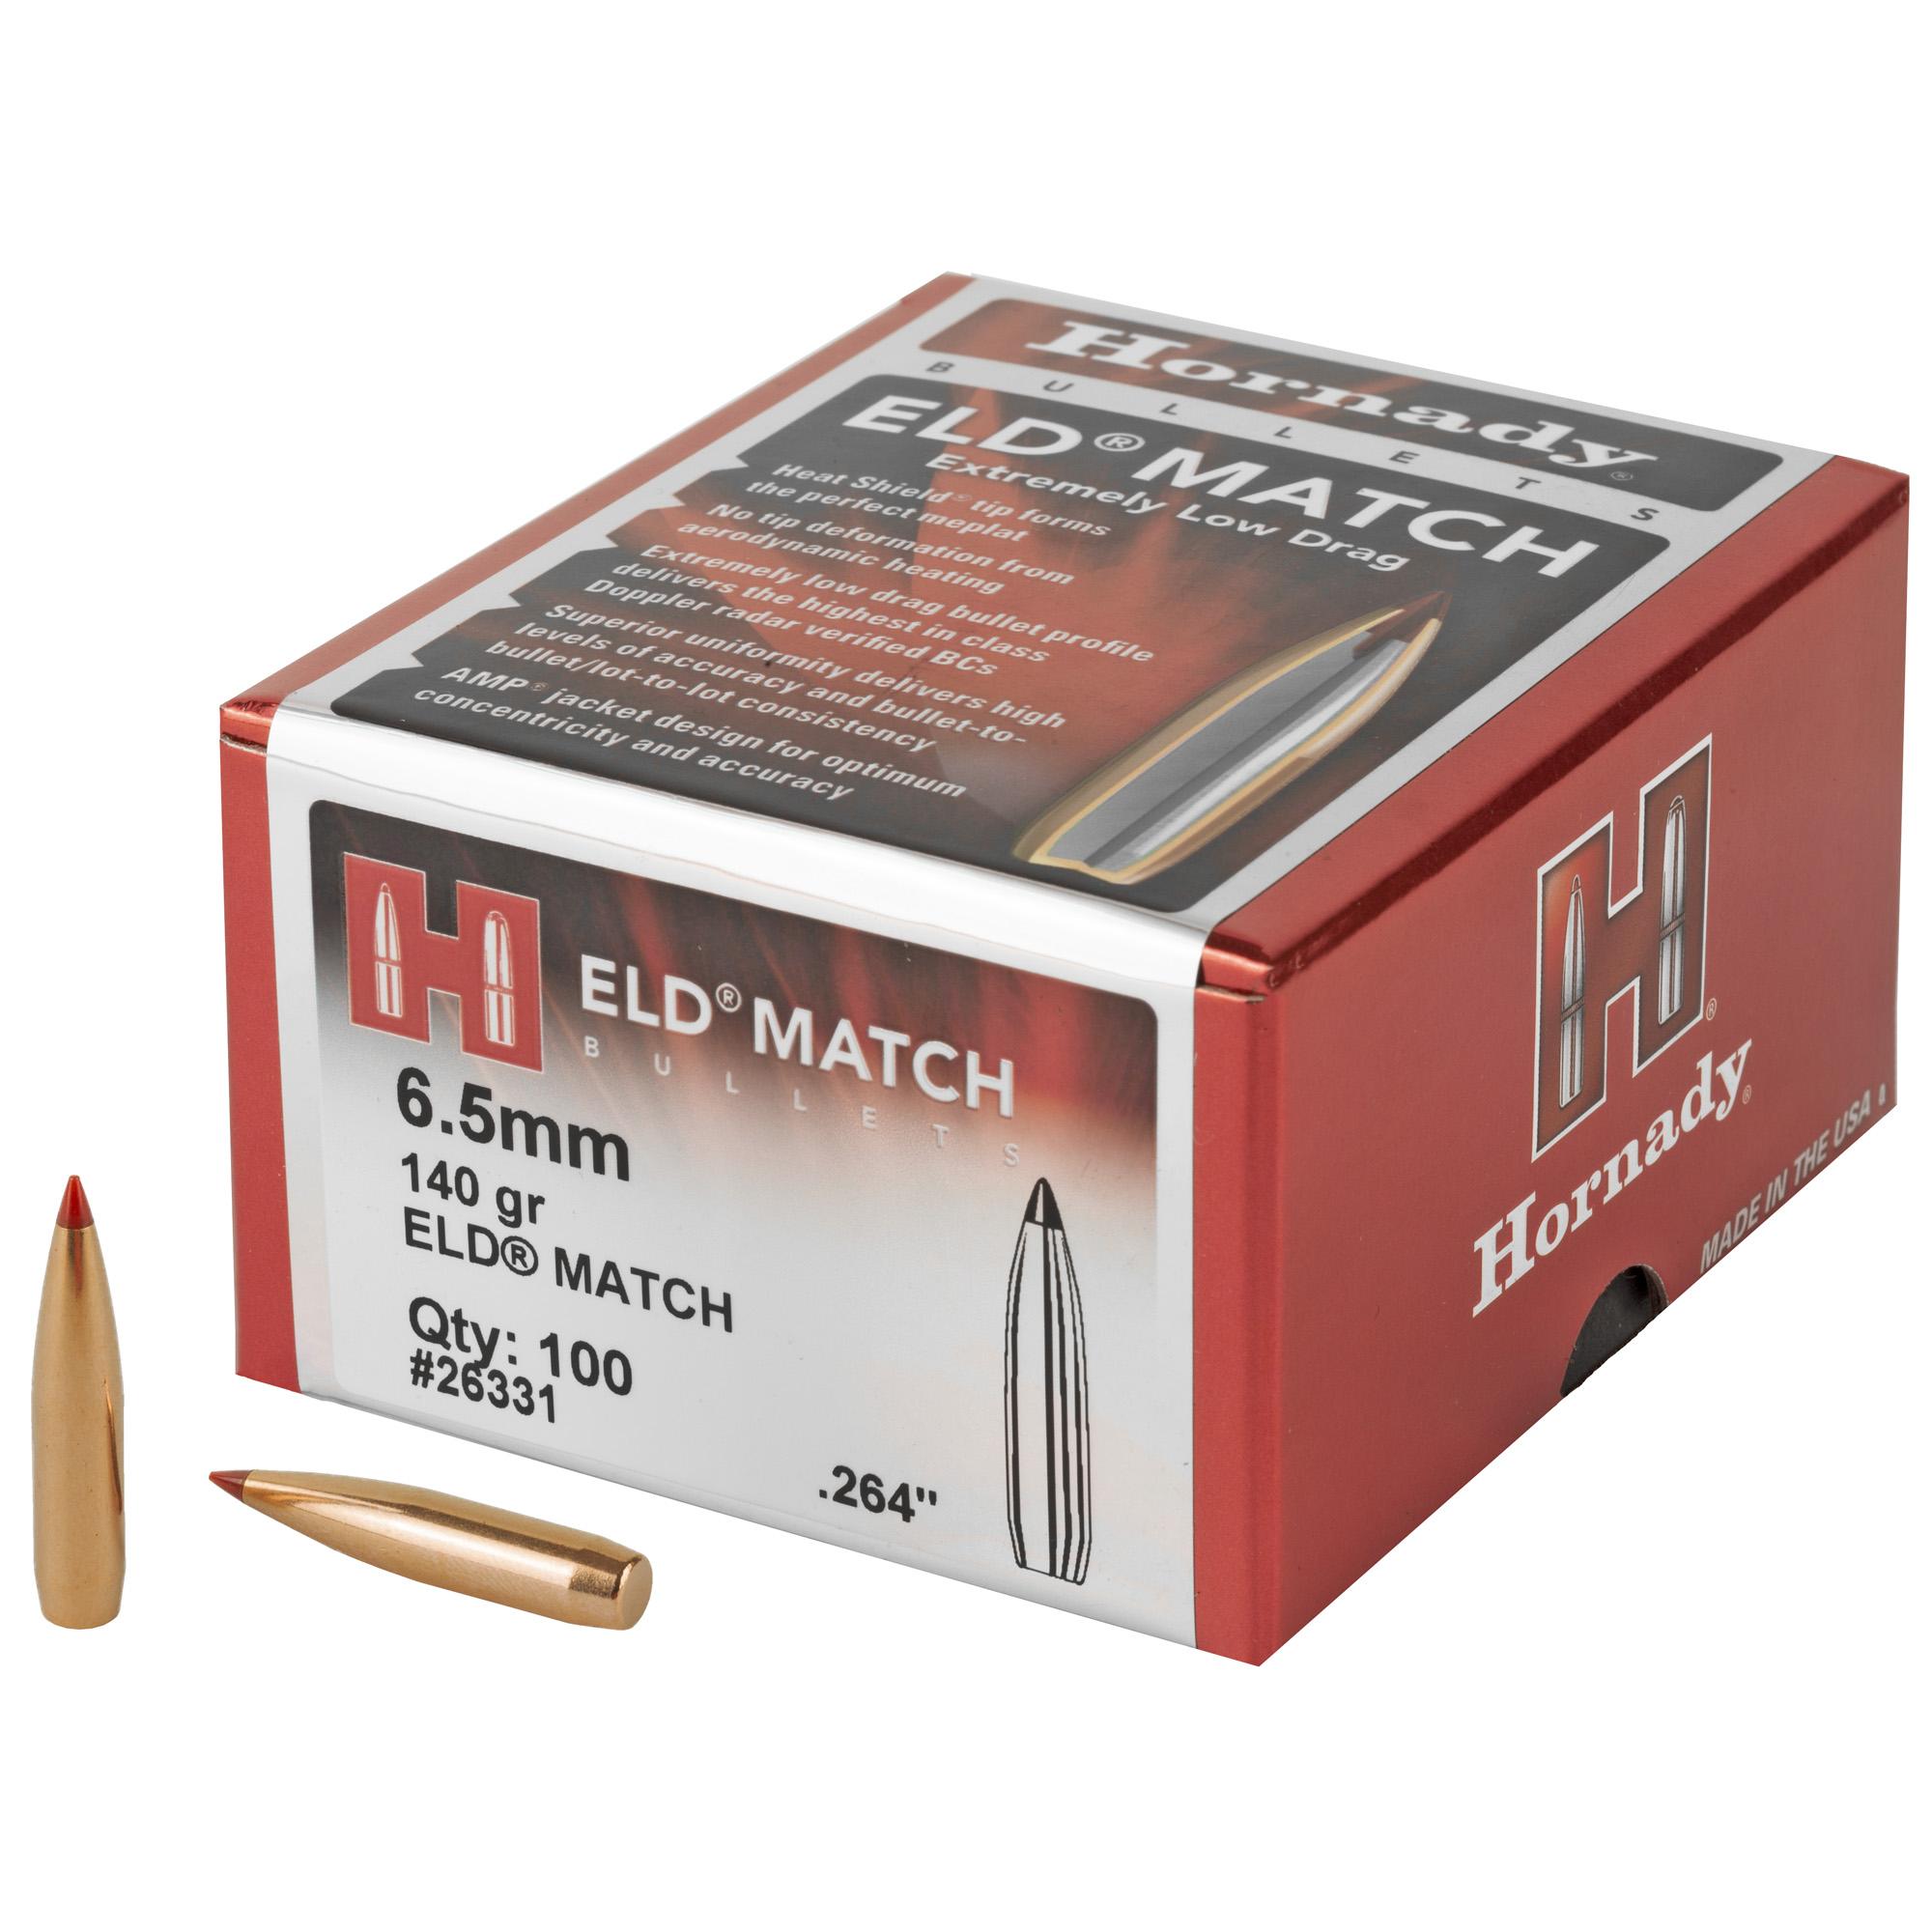 Hrndy Eld-m 6.5mm .264 140gr 100ct